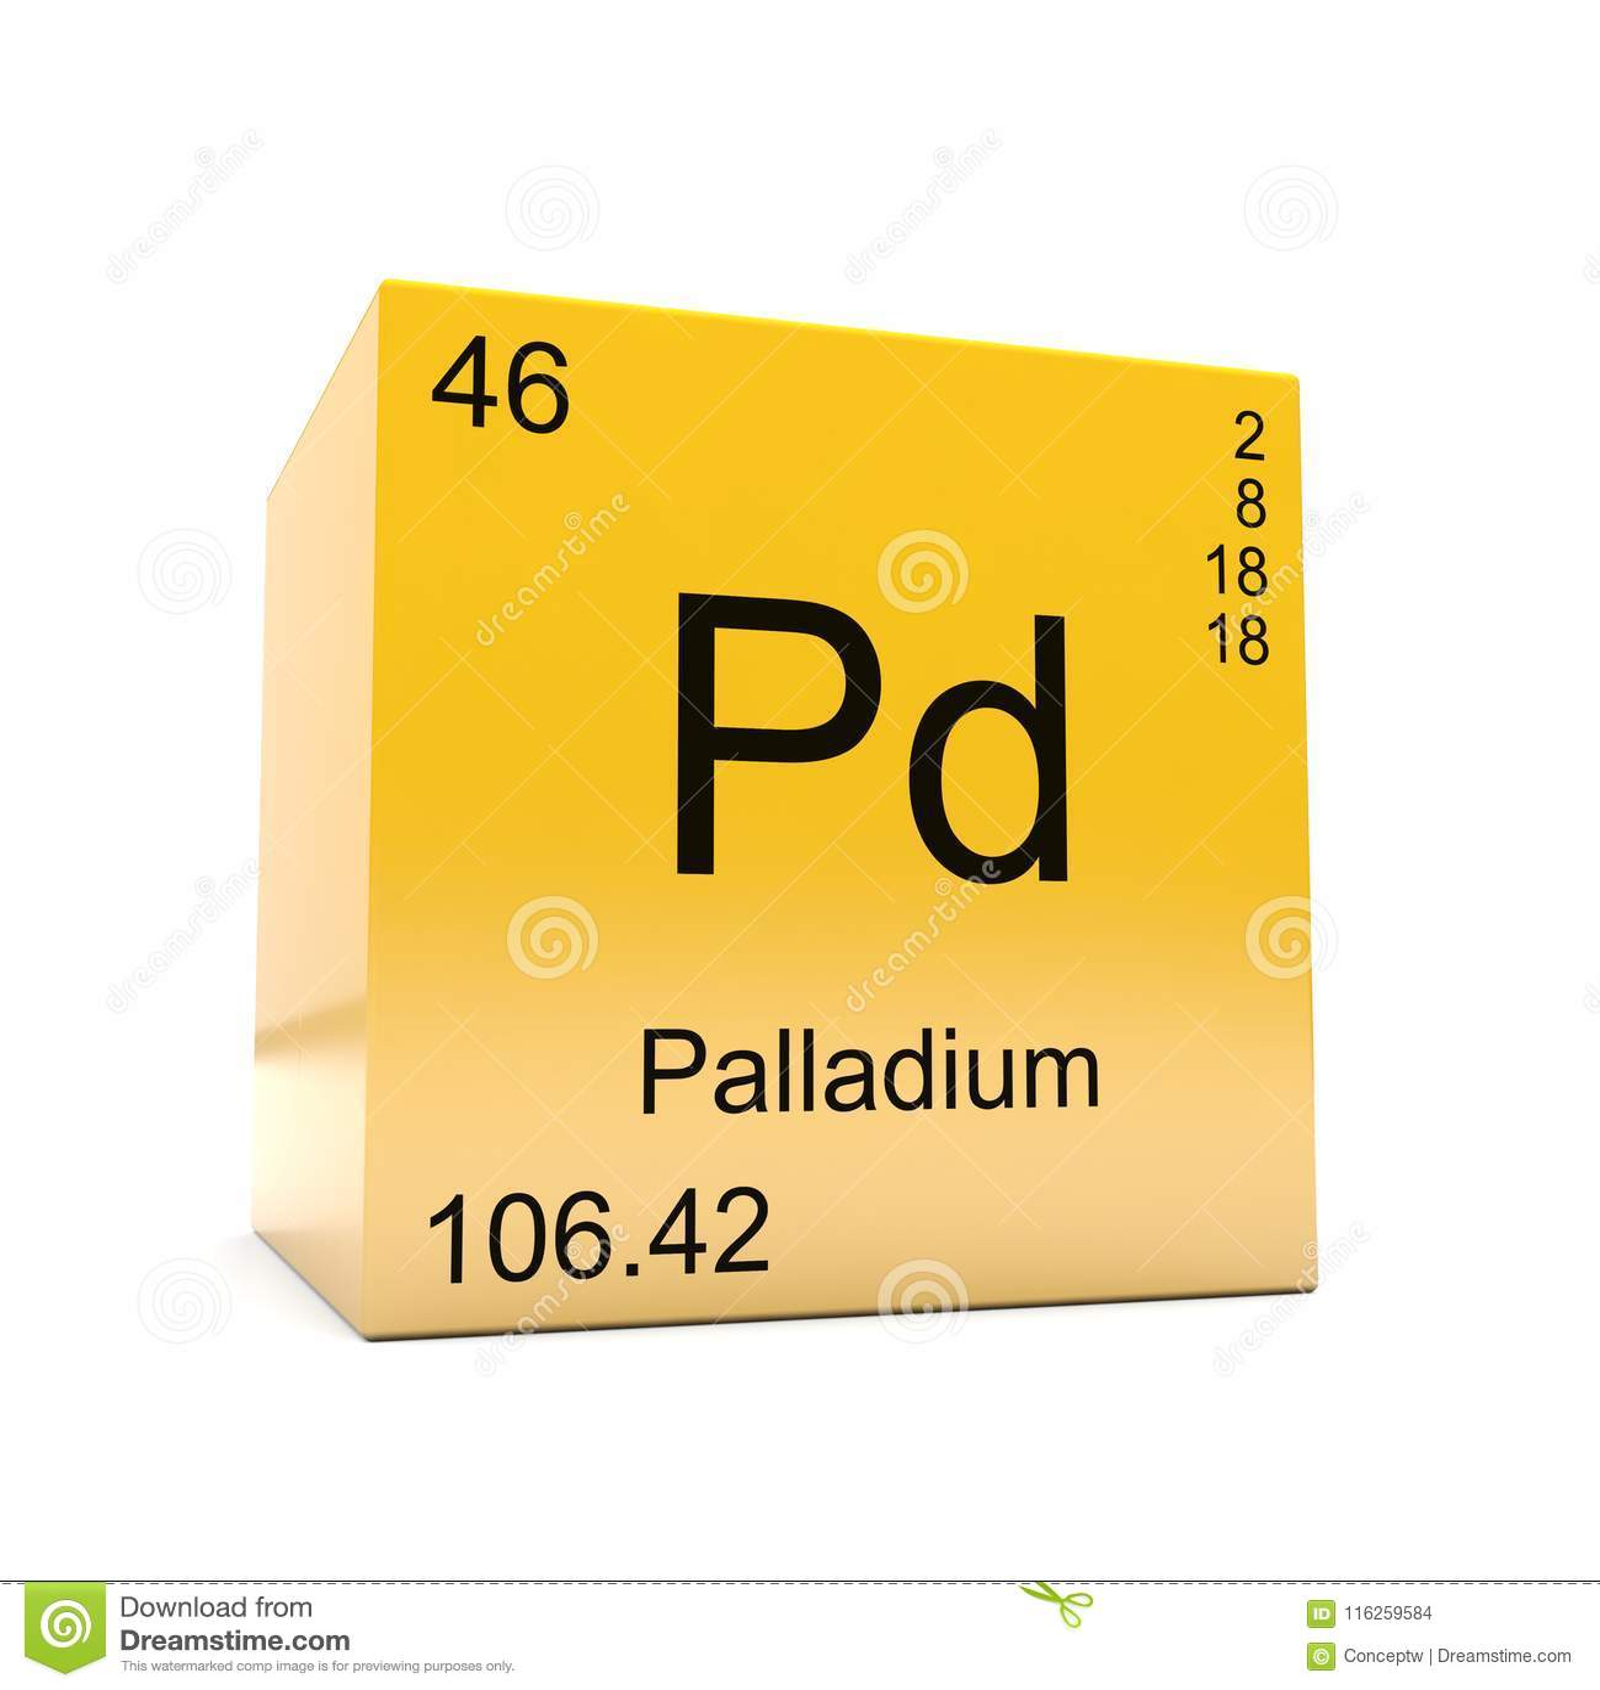 Palladium Chemical Element Symbol From Periodic Table Stock